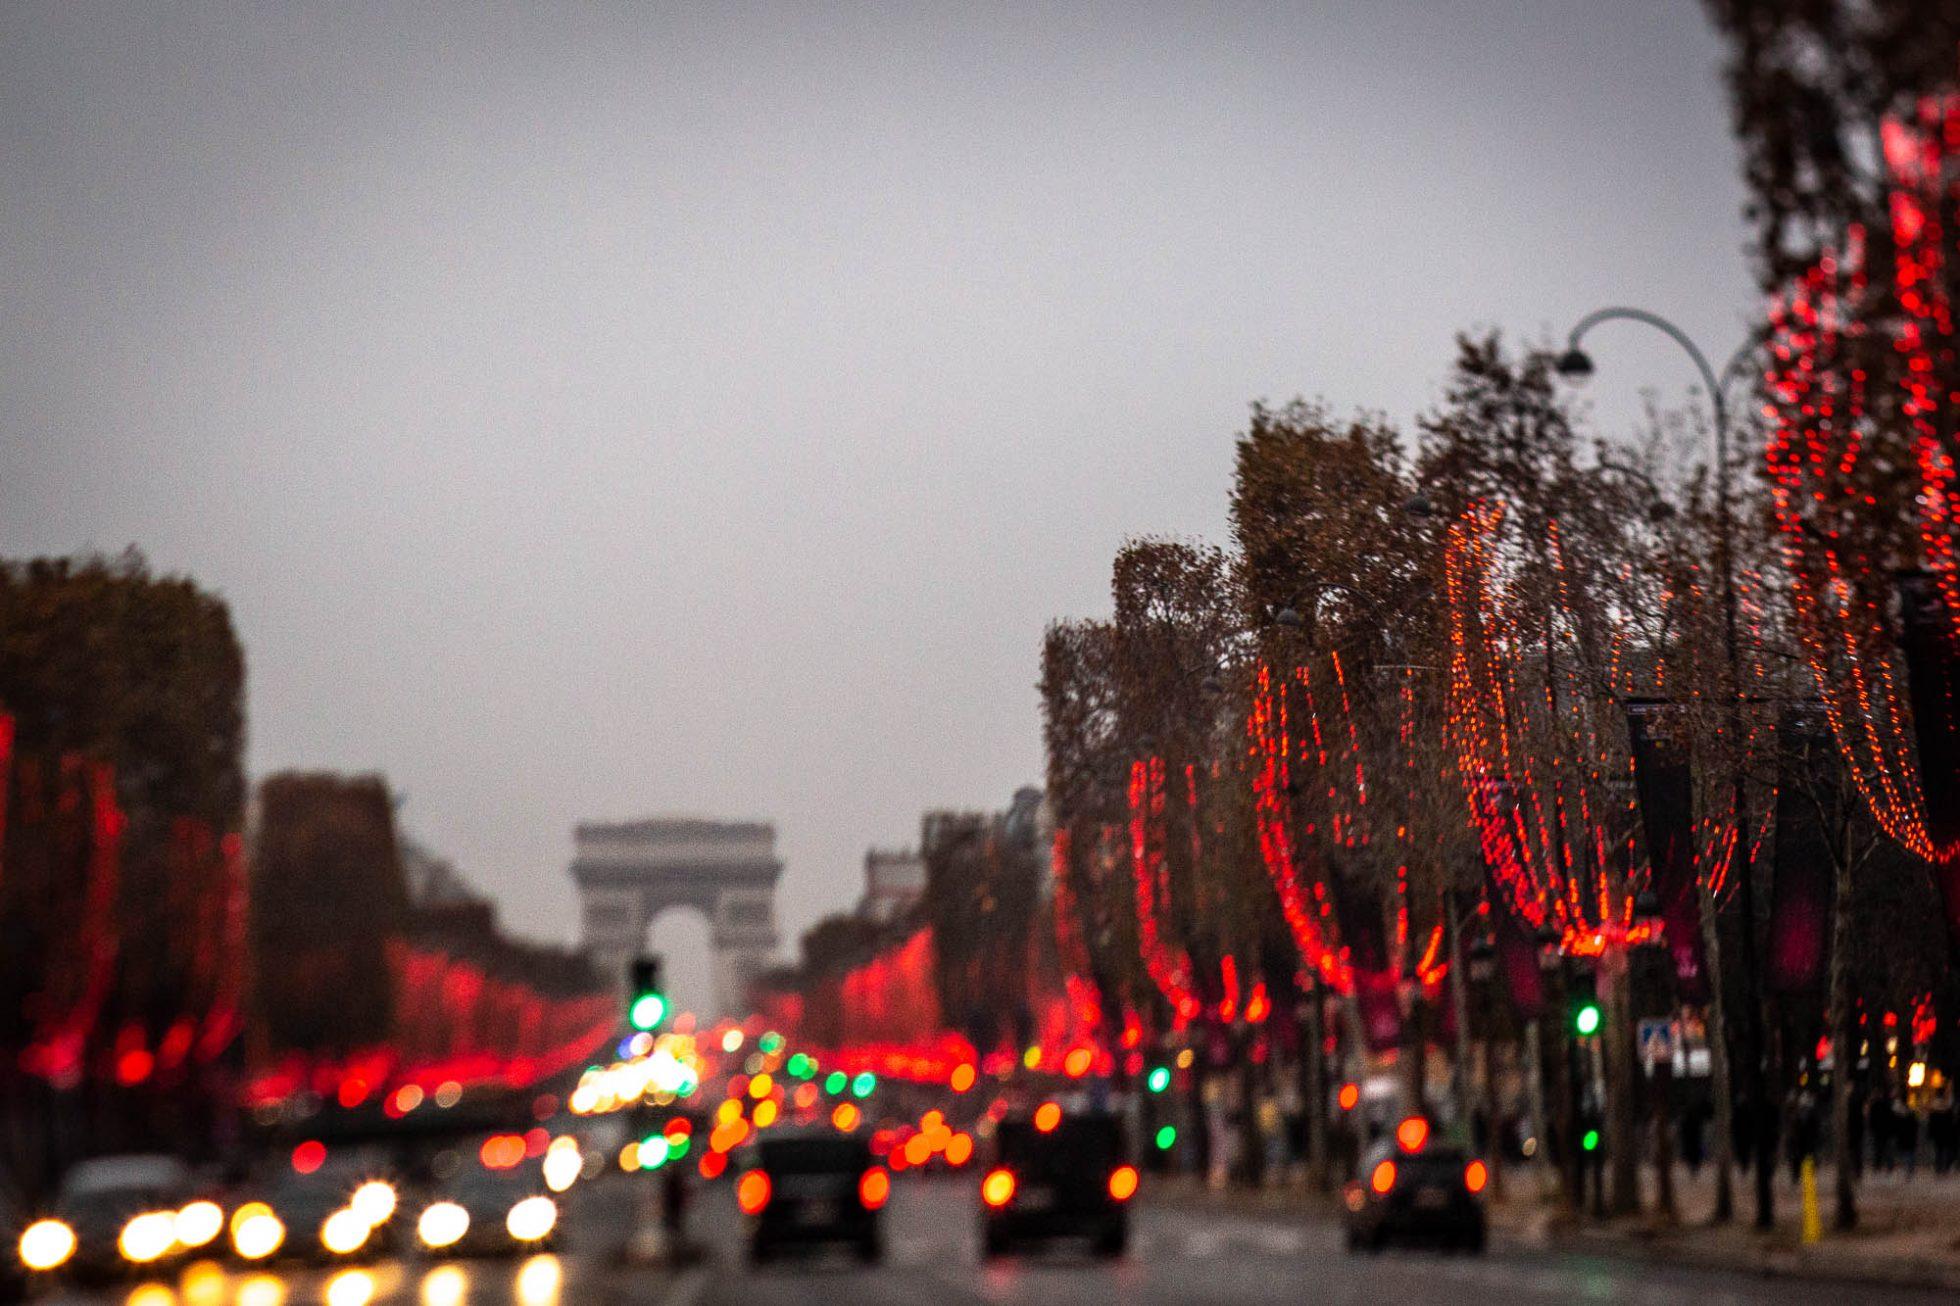 Paris holiday lights - Champs Elysées - Merja Varkemaa Photography